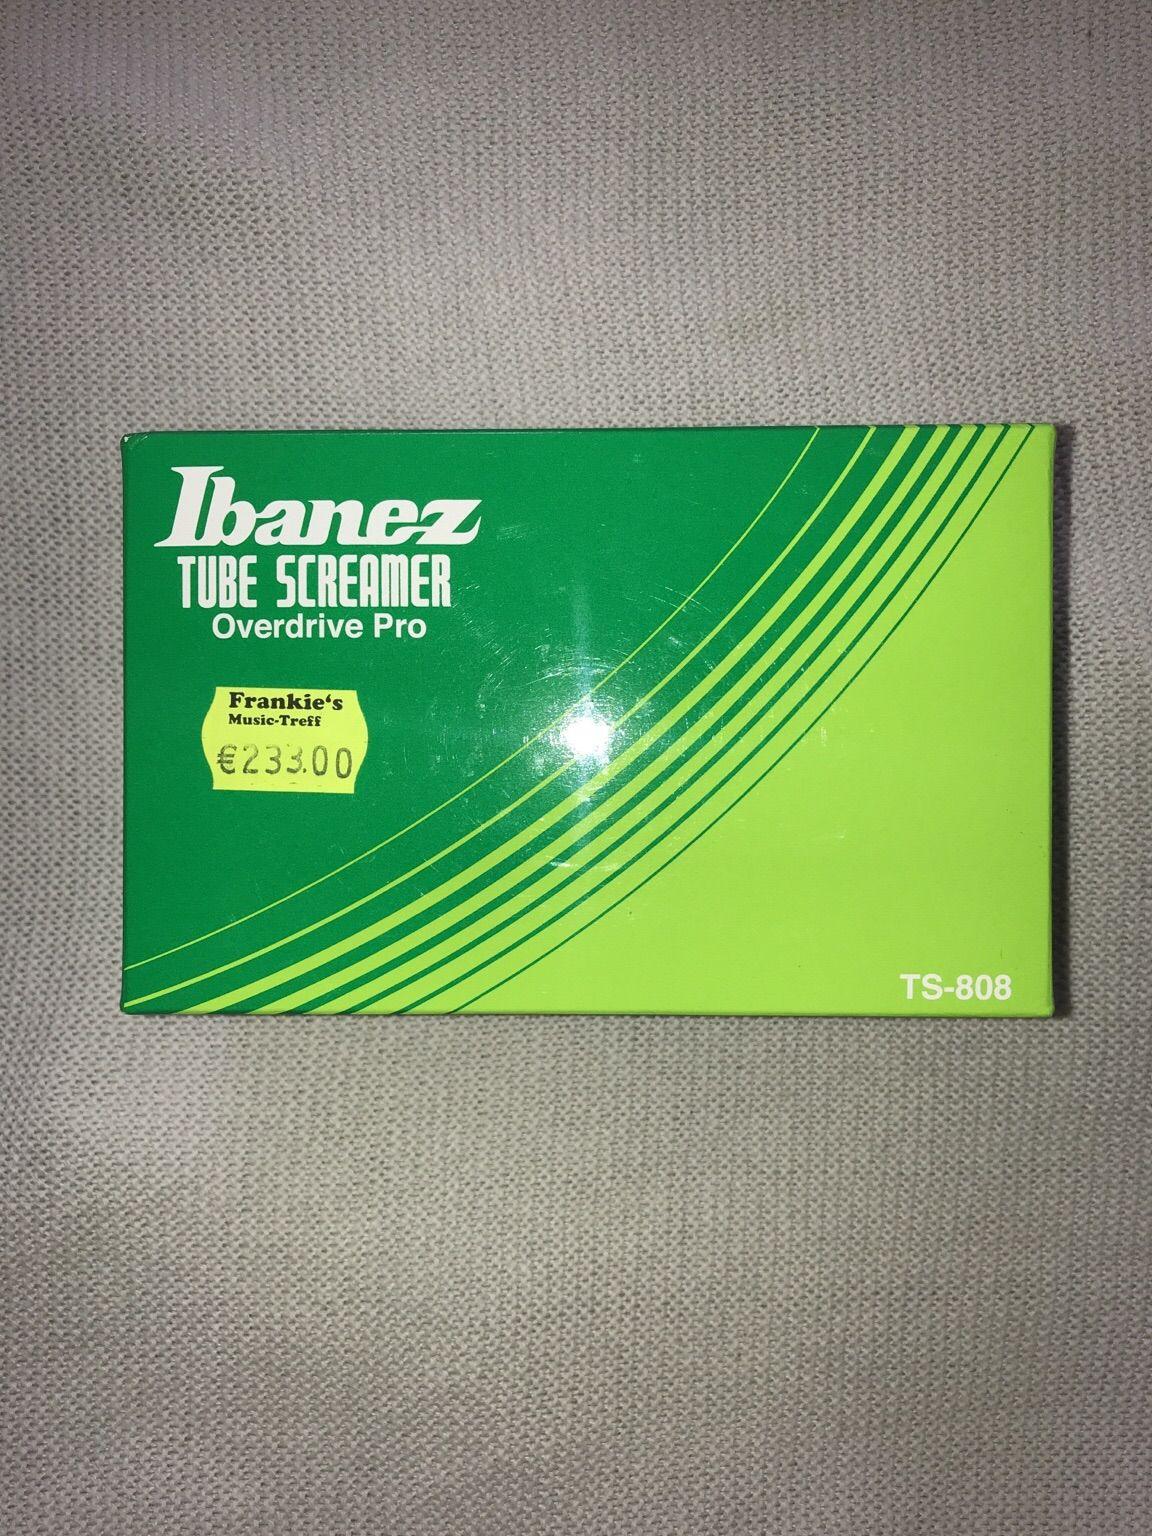 Ibanez-Tune-Screamer-overdrive-projpg